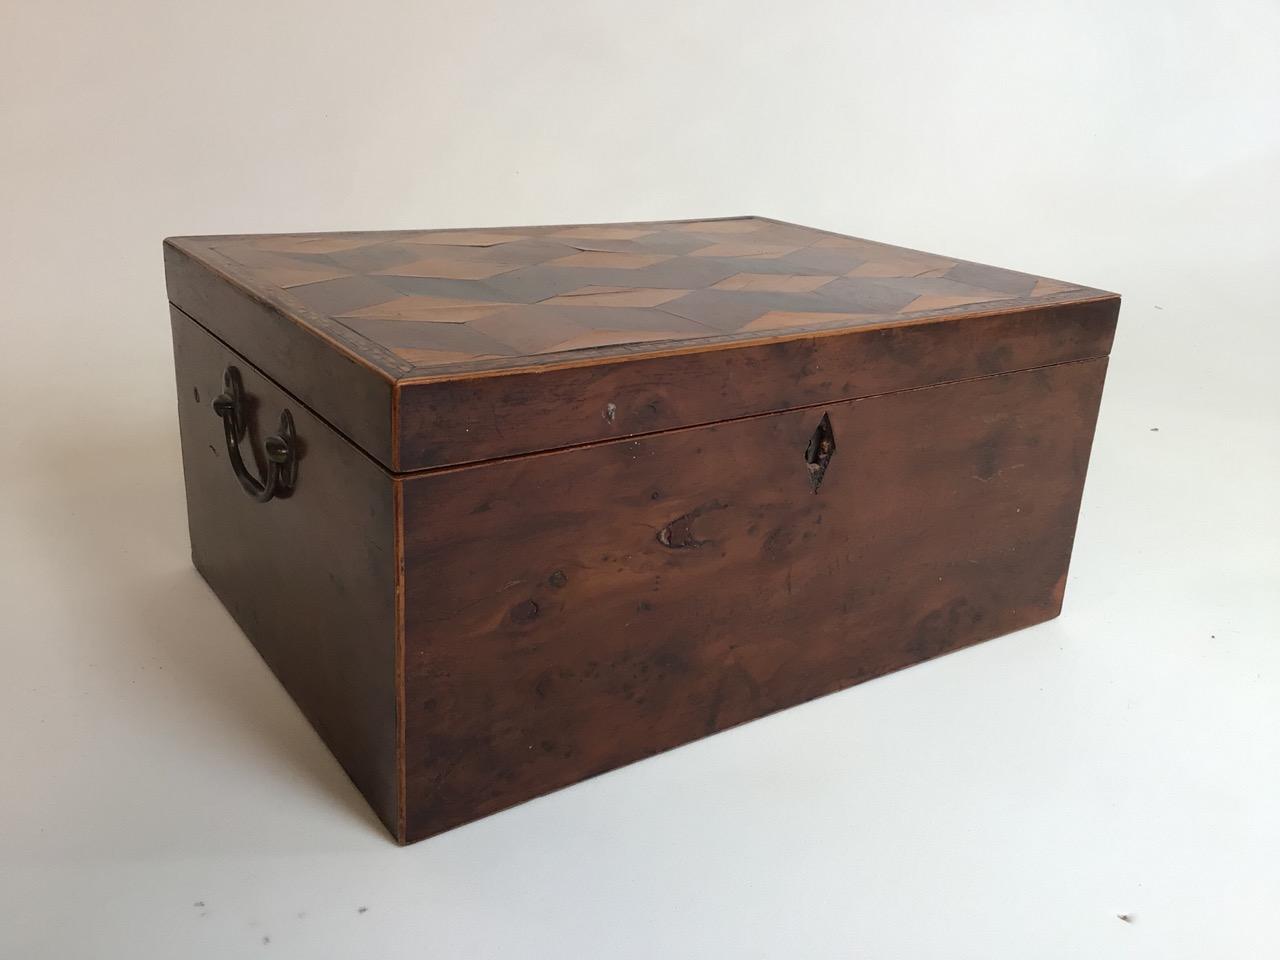 A Victorian parquetry walnut box with metal handles. W:33cm x D:24cm x H:15cm